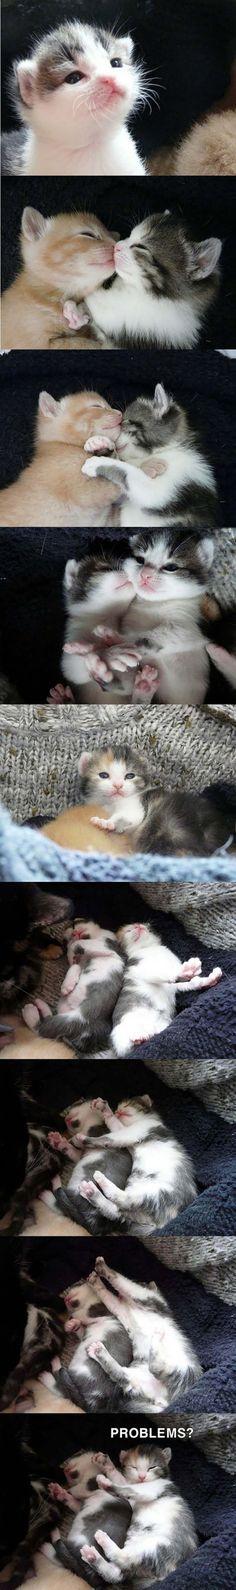 Orange and calico kittens